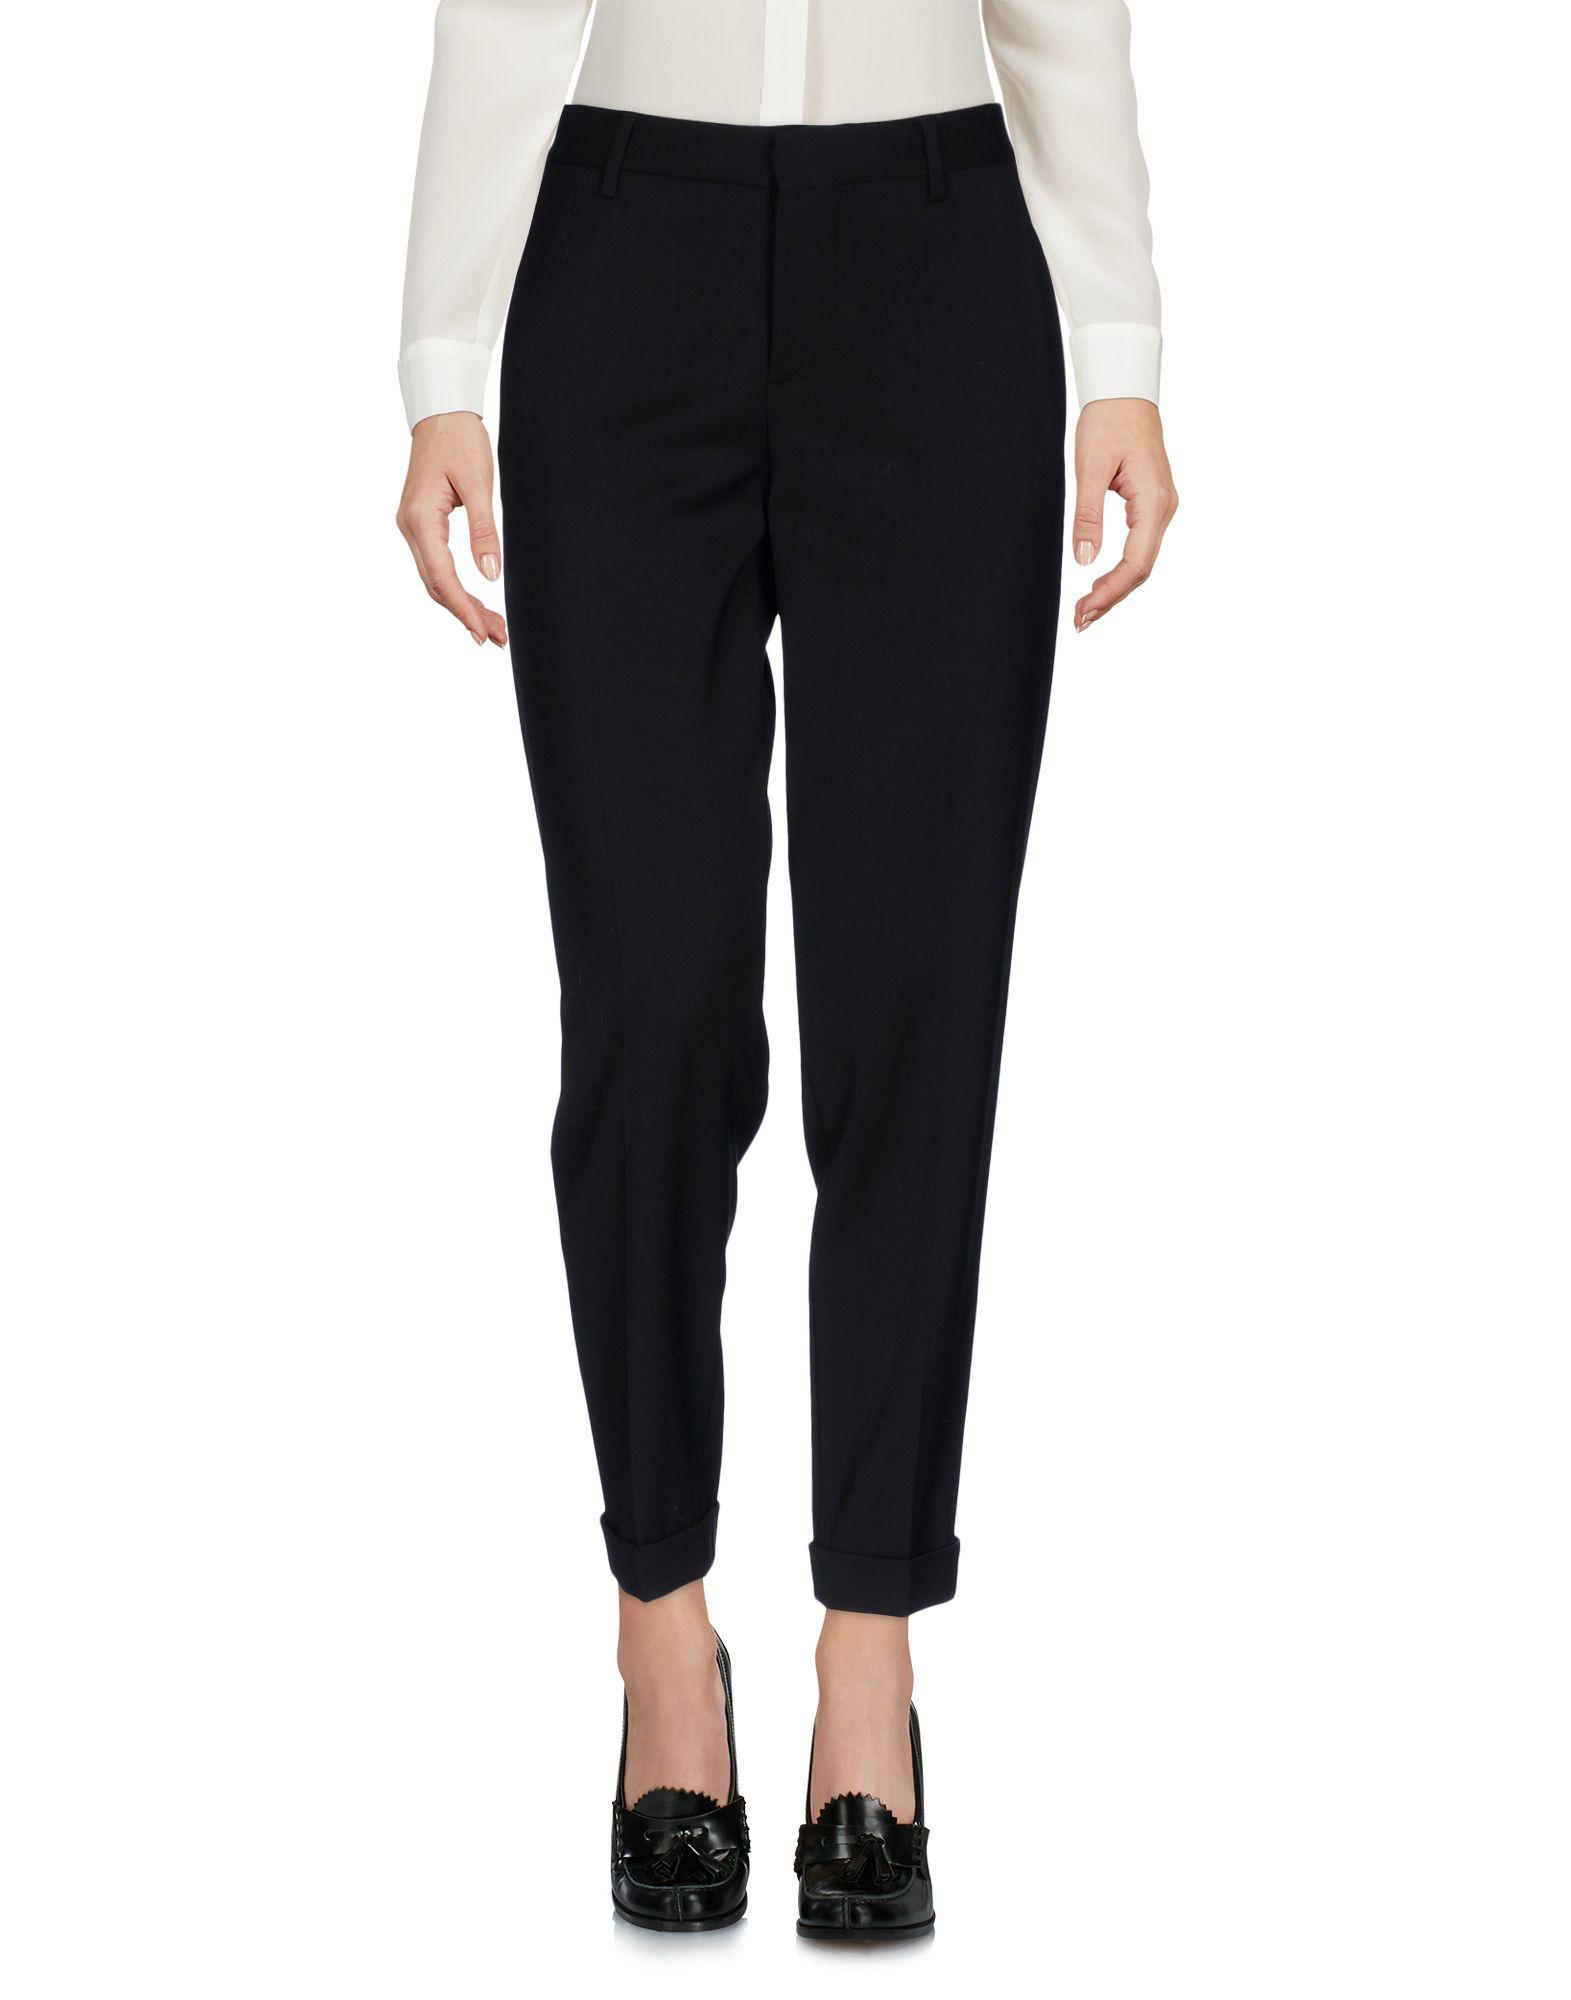 DSQUARED2 Damen Hose Farbe Schwarz Größe 2